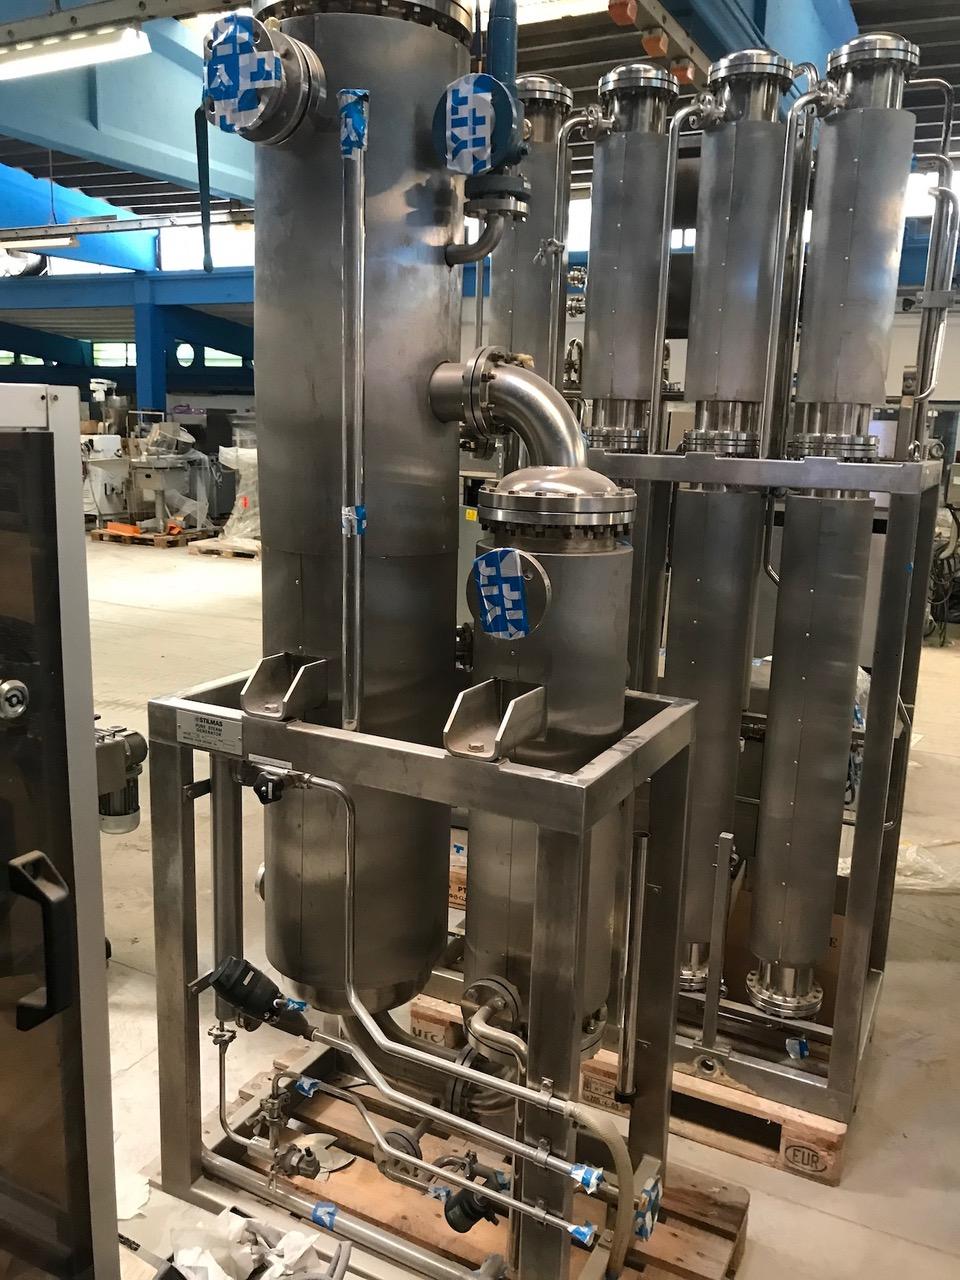 STILMAS Generatore di vapore Stilmas psg 300 DTS